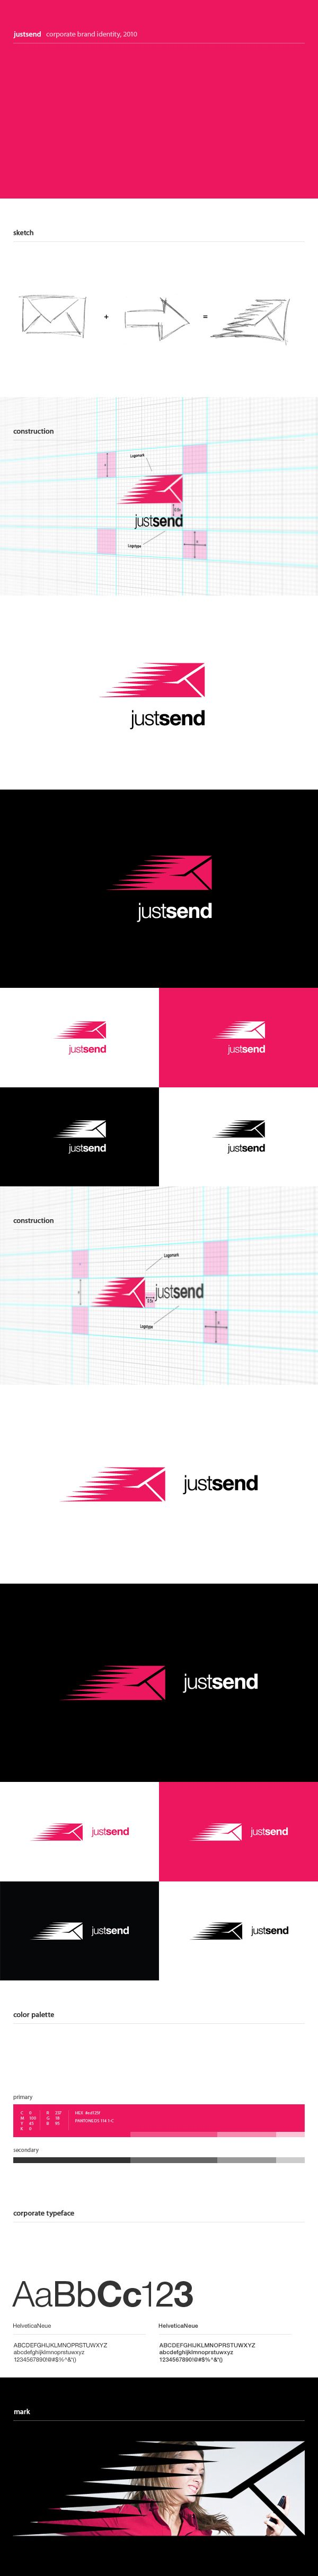 Logo design process for JustSend